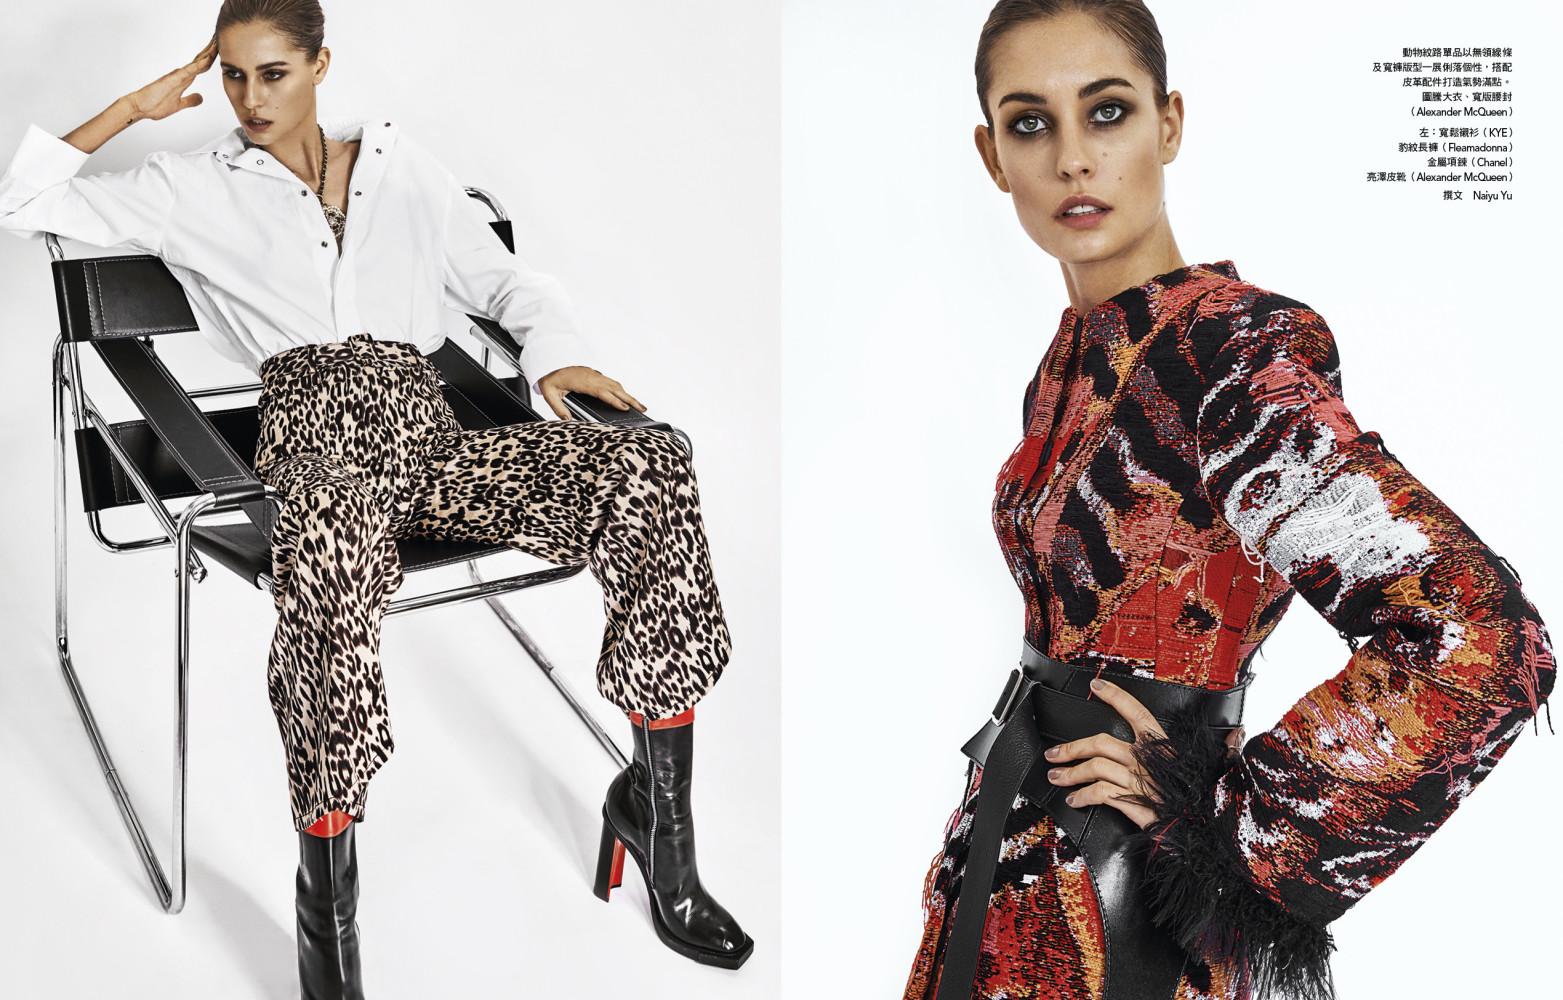 NADJA BENDER for Vogue Taiwan by Caleb & Gladys